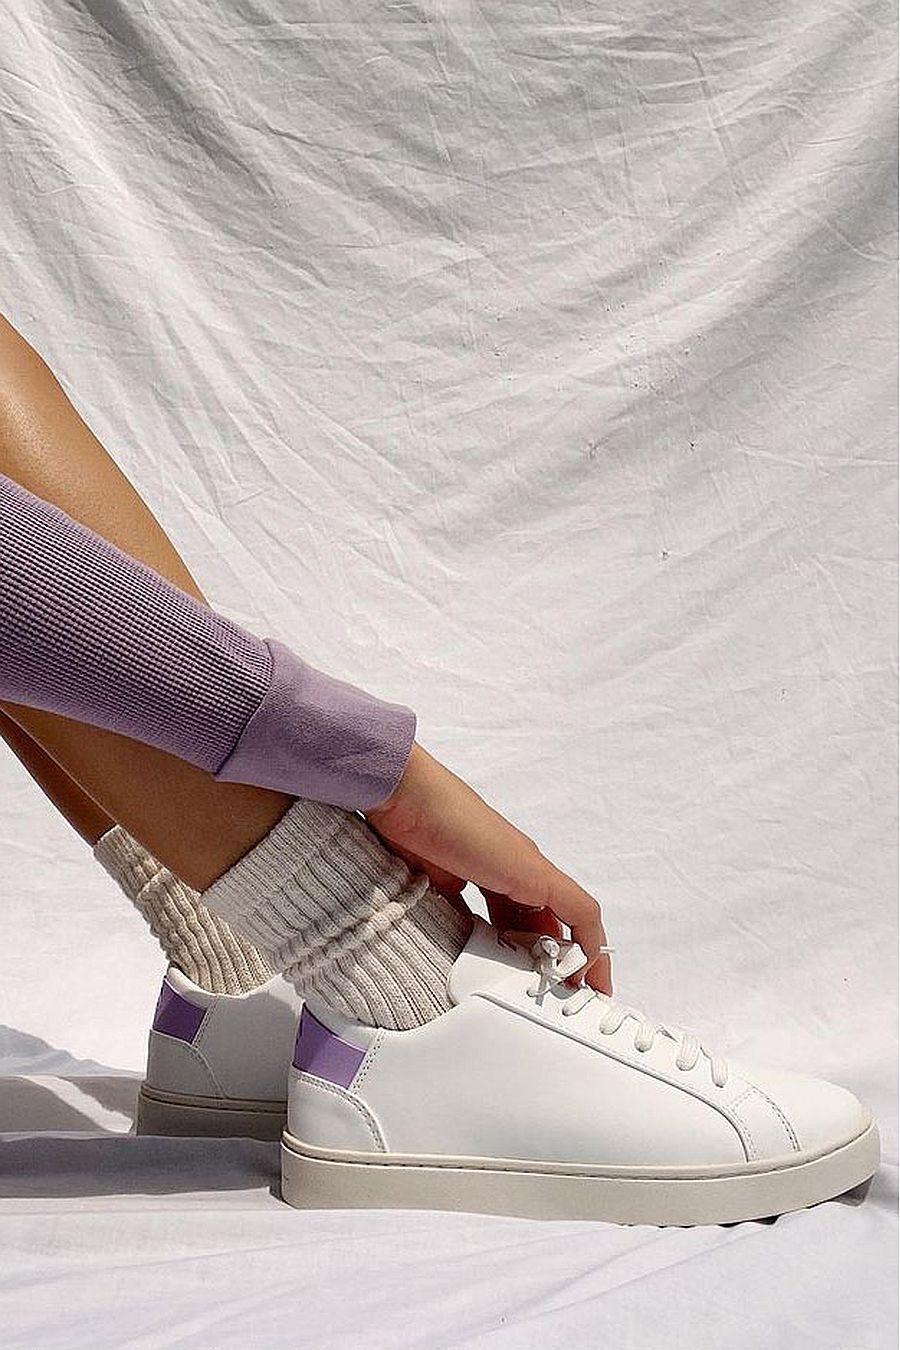 Thousand Fell Women's Lace Up   Psychic Wave (Purple)